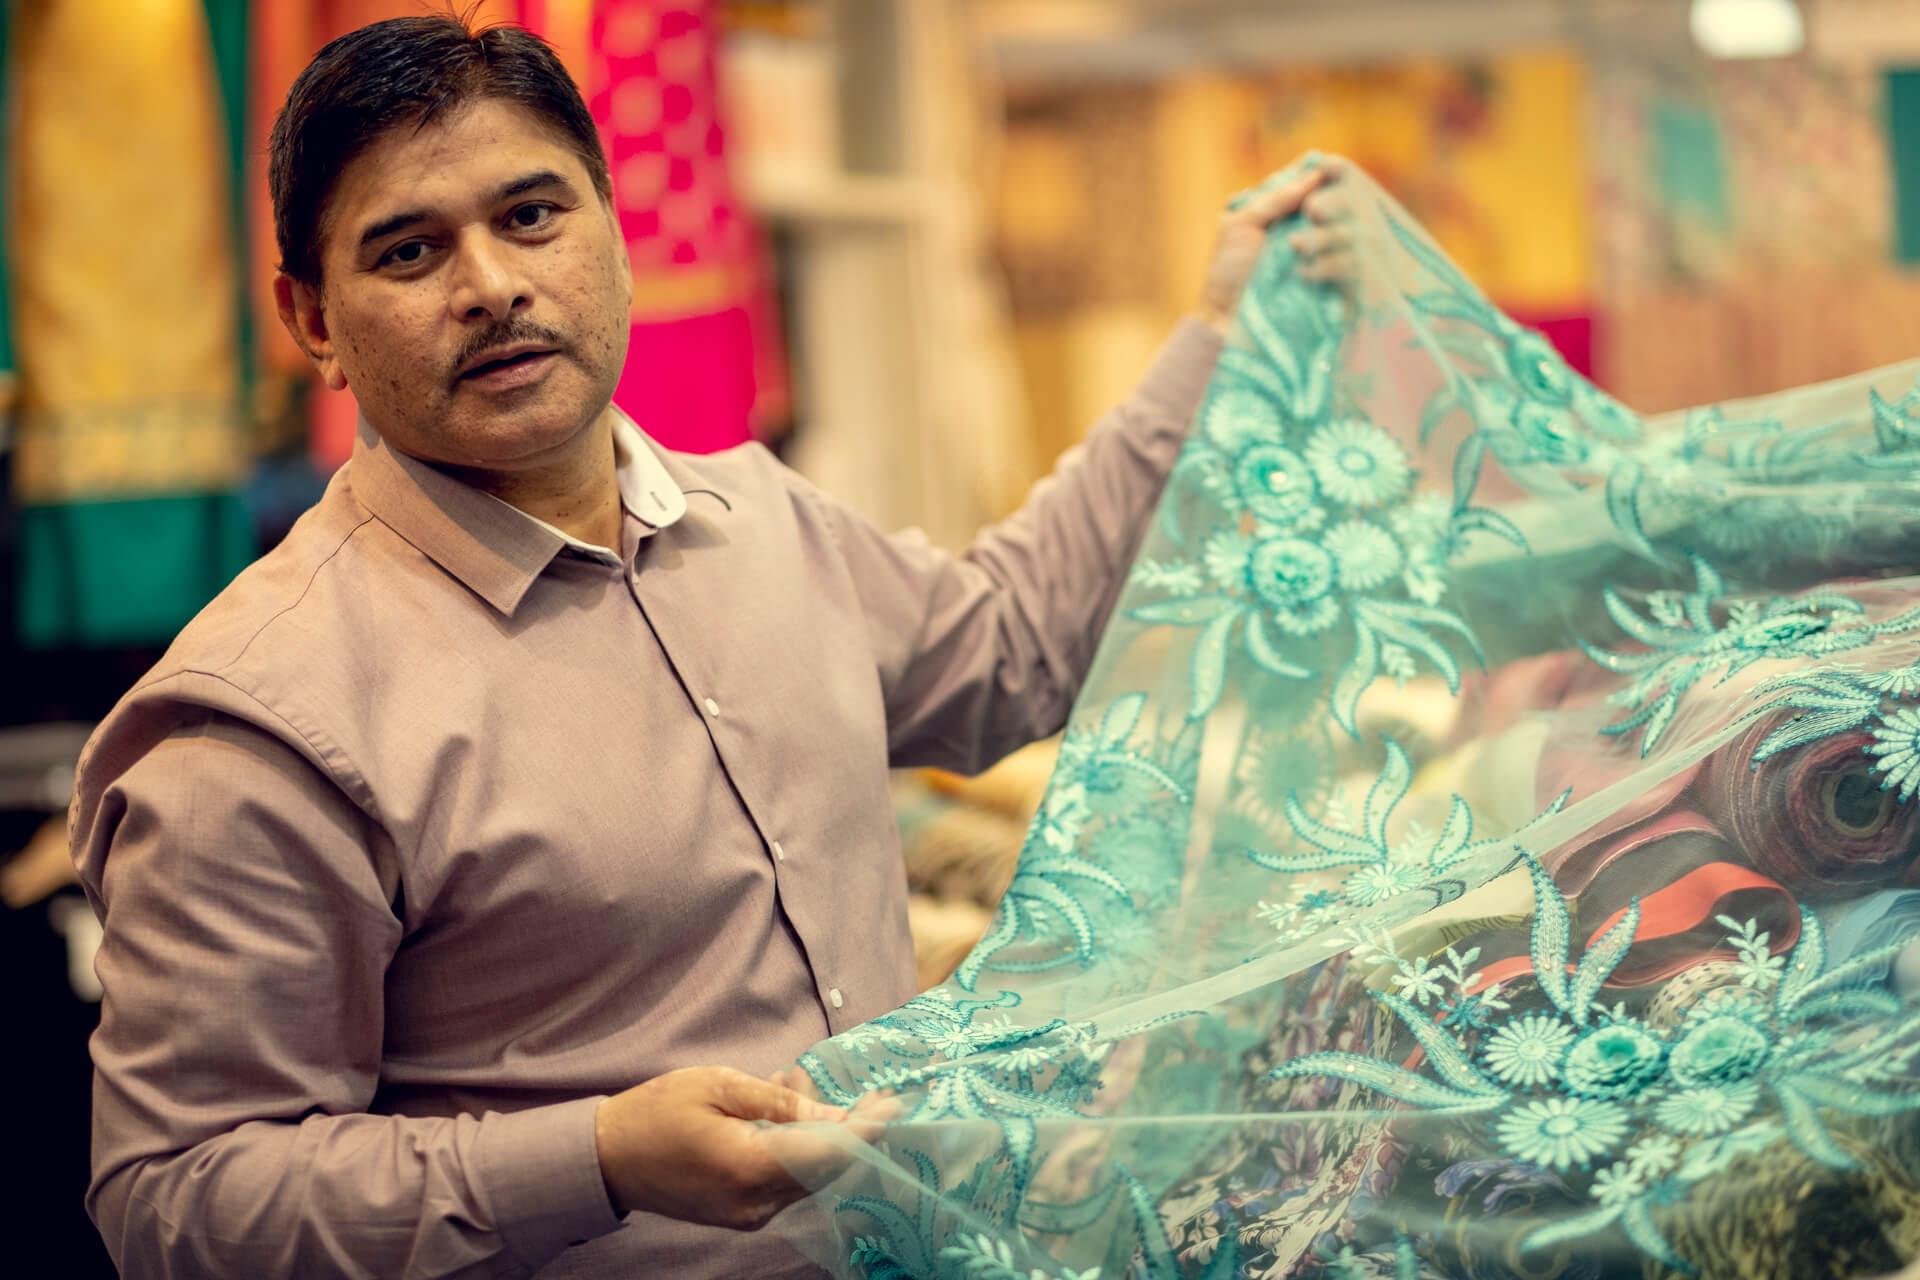 Sheikh´s Fashion fargerike stoff på Grønland Torg